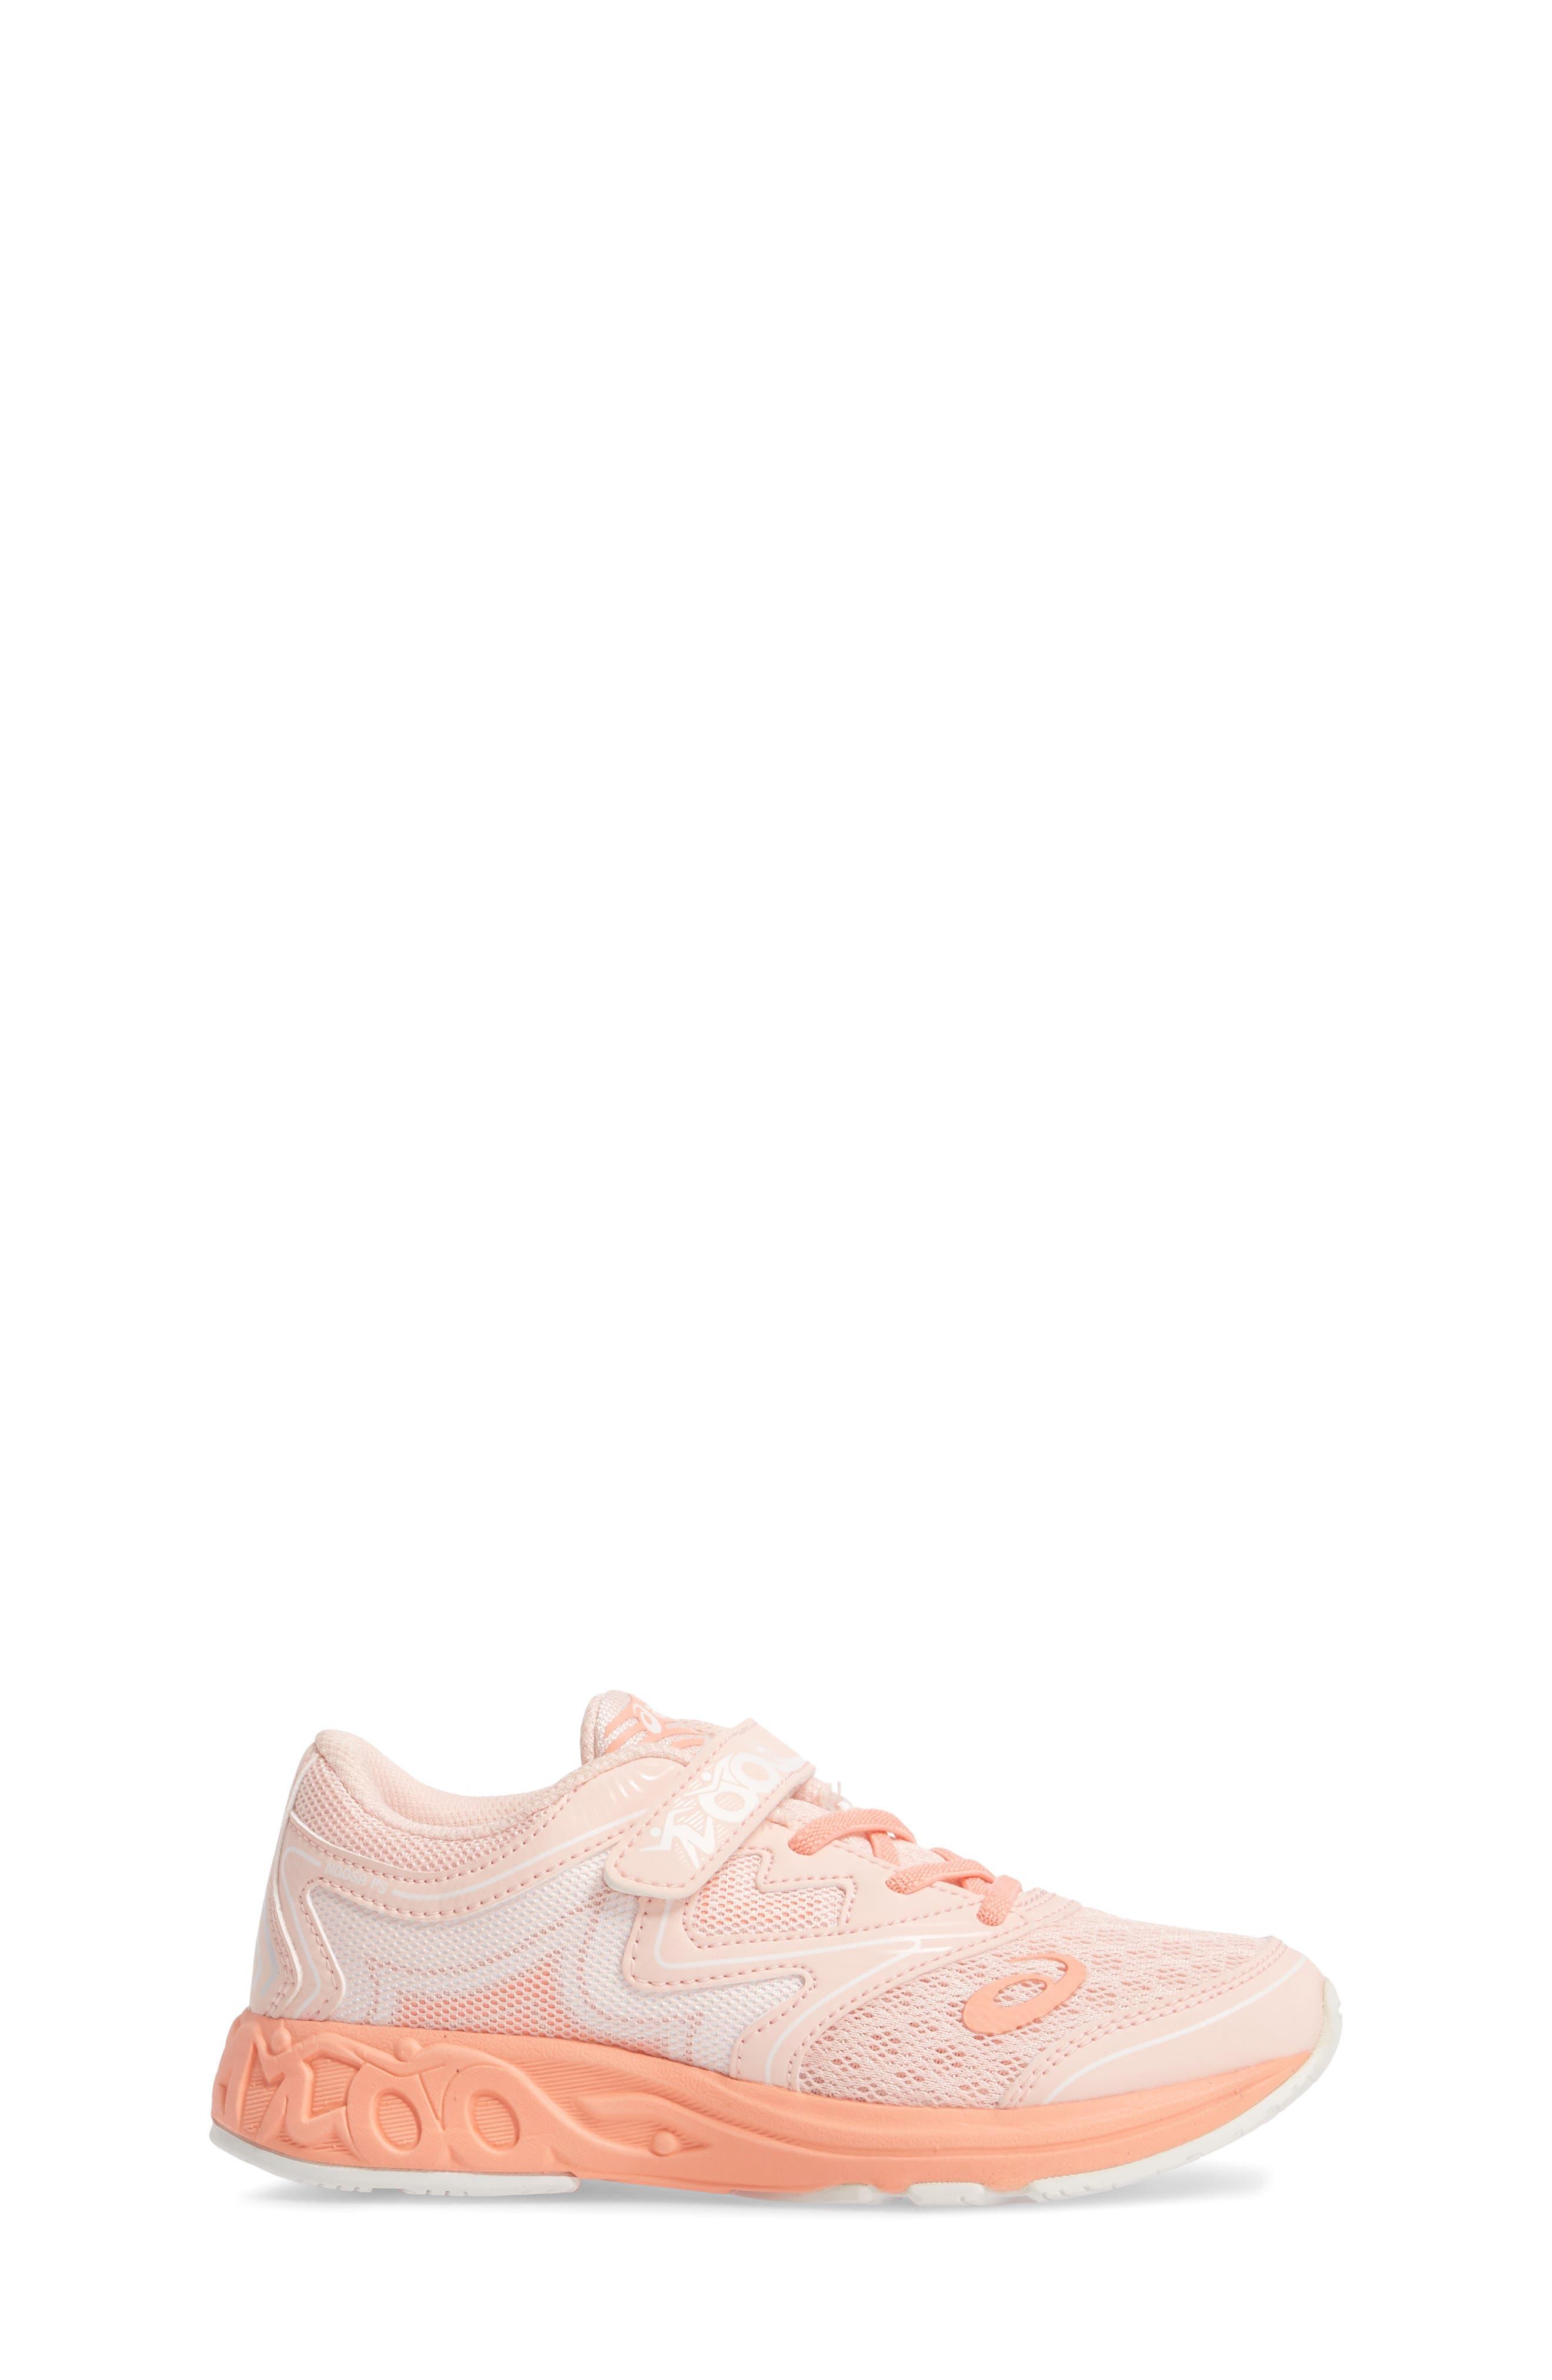 Noosa PS Sneaker,                             Alternate thumbnail 3, color,                             Seashell Pink/ Begonia/ White